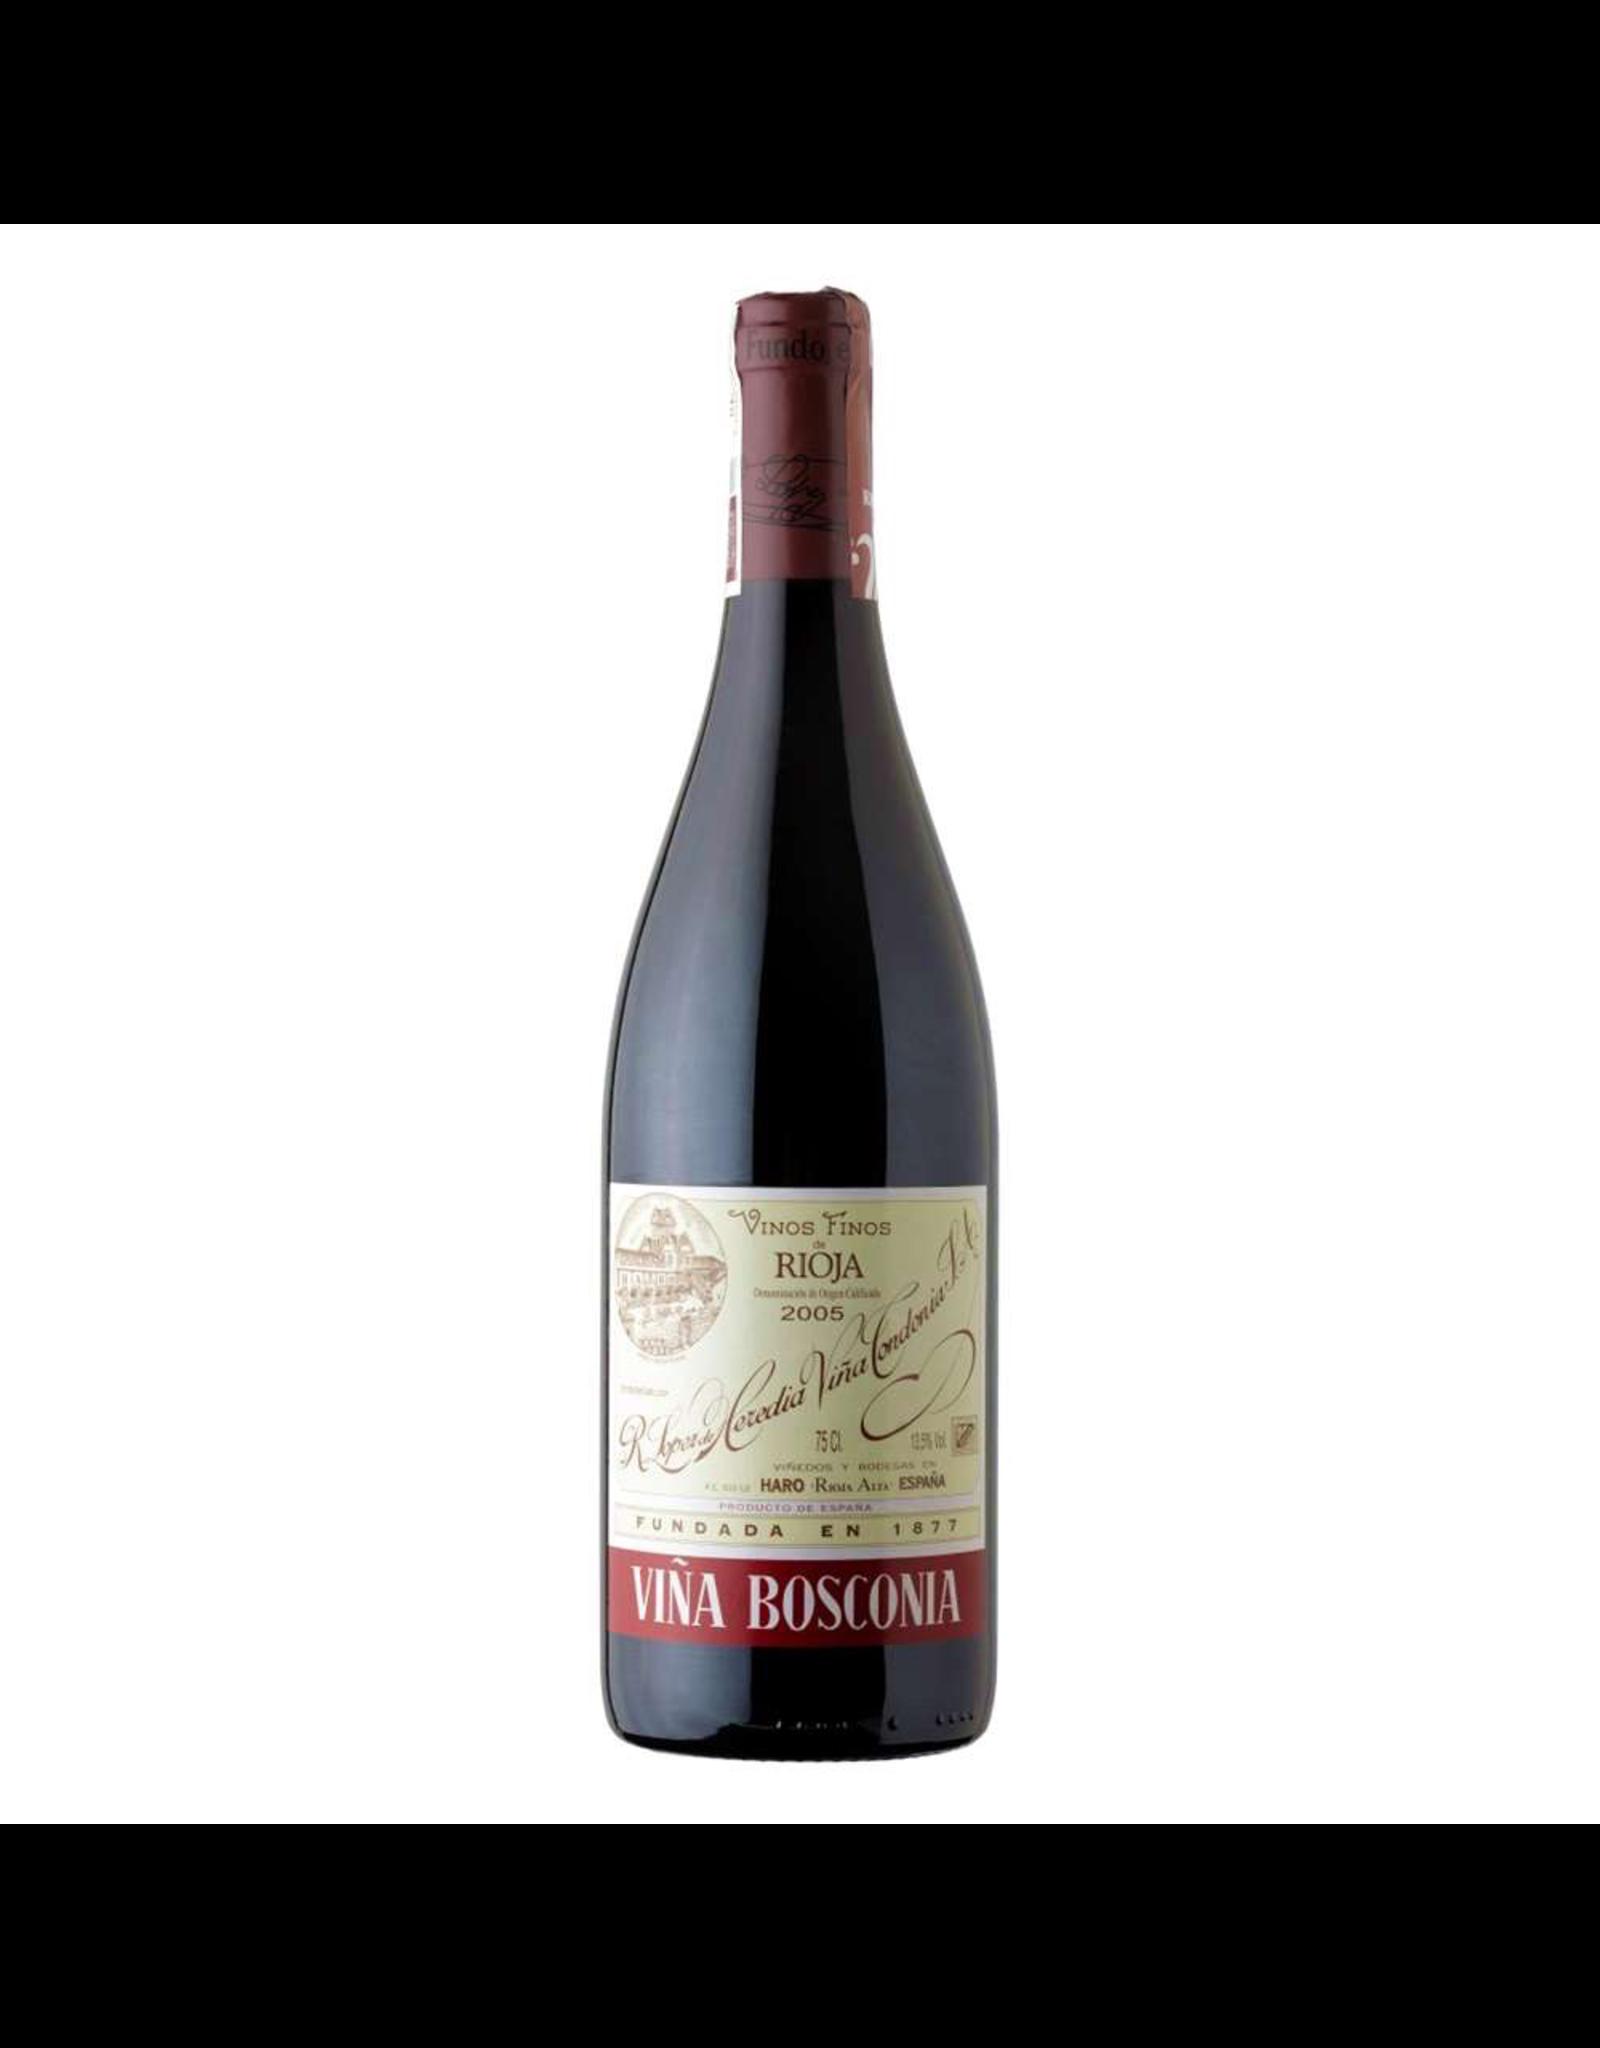 Red Wine 2006, Lopez Hereida Vina Bosconia, Red Tempranillo Blend, Haro, Ribeiro Del Duero, Spain, 13.5% Alc, CT